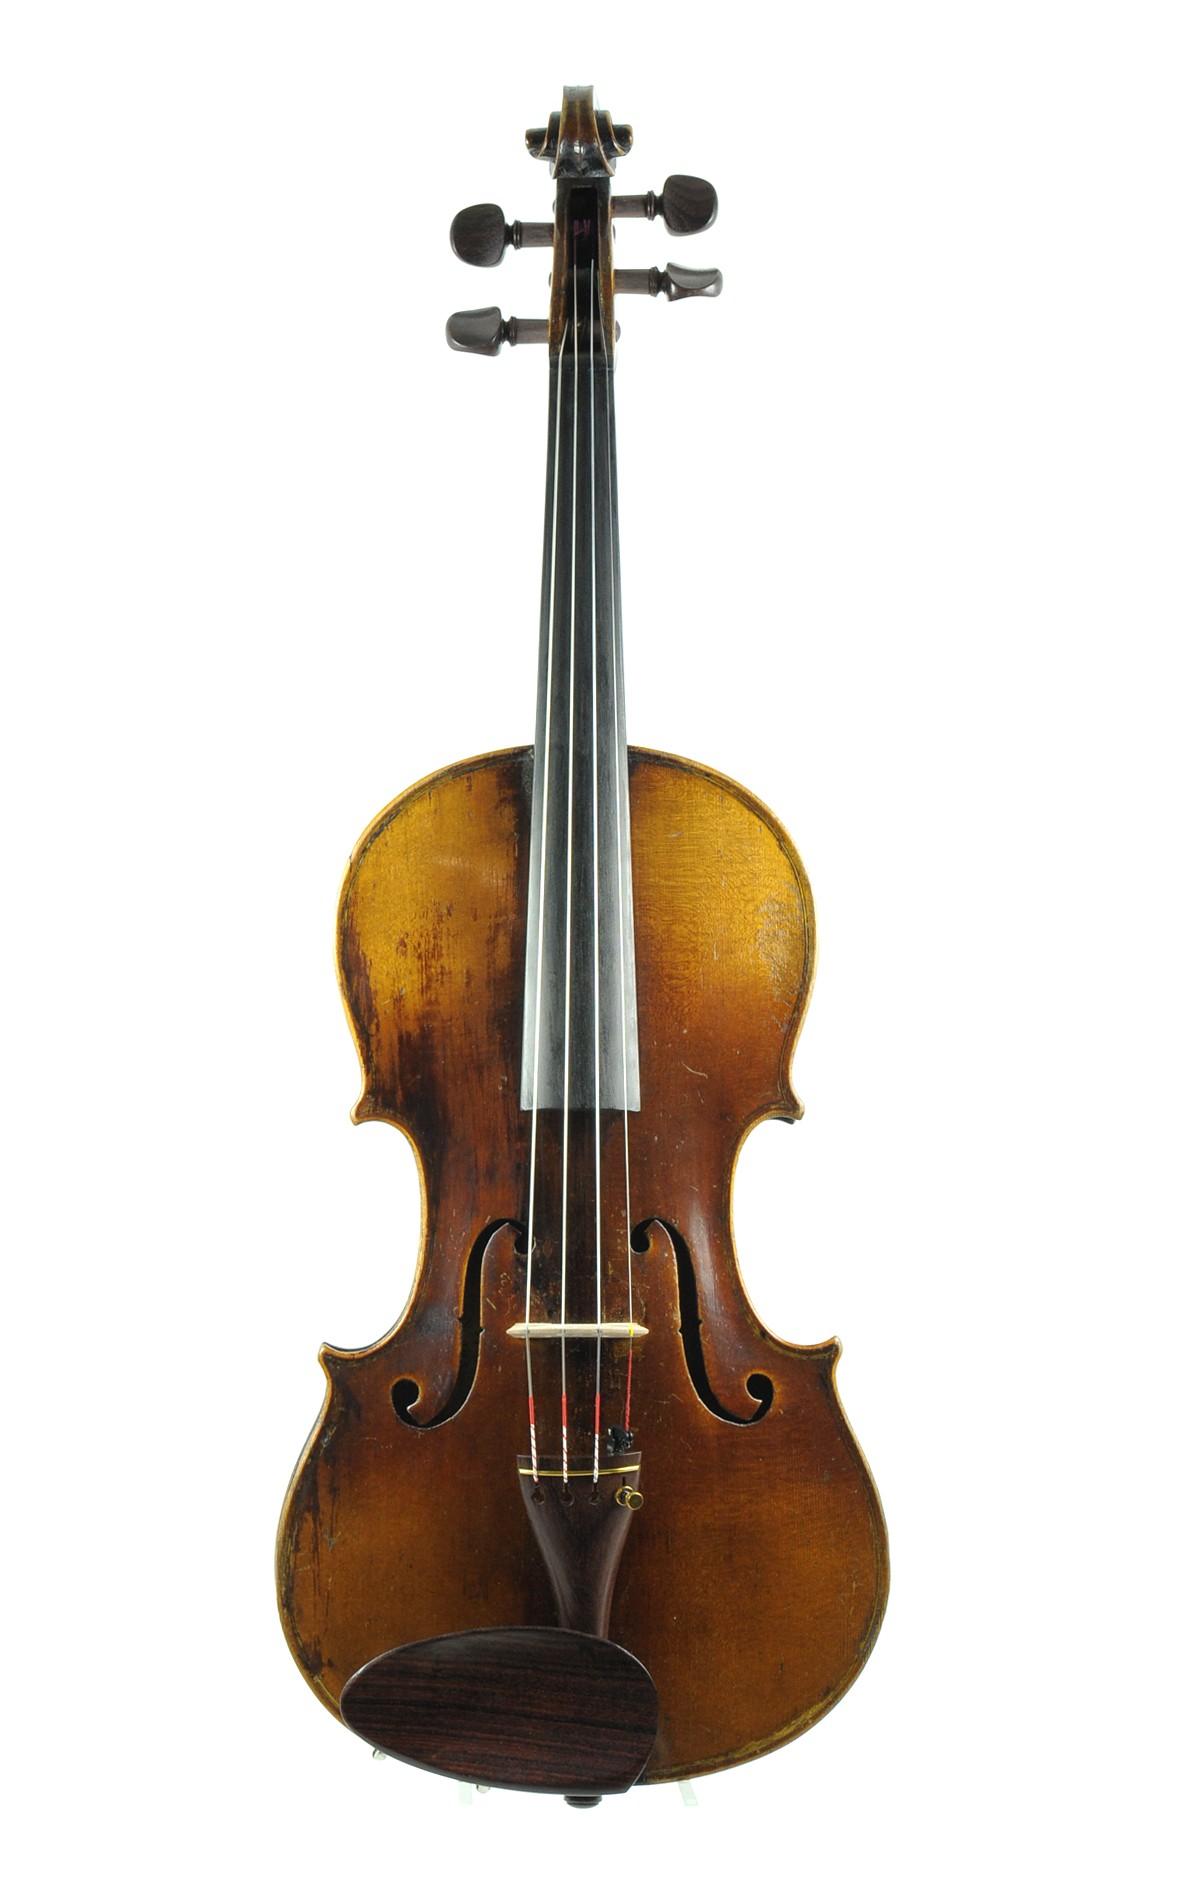 Christian Hoffmann, violin 1879 - top